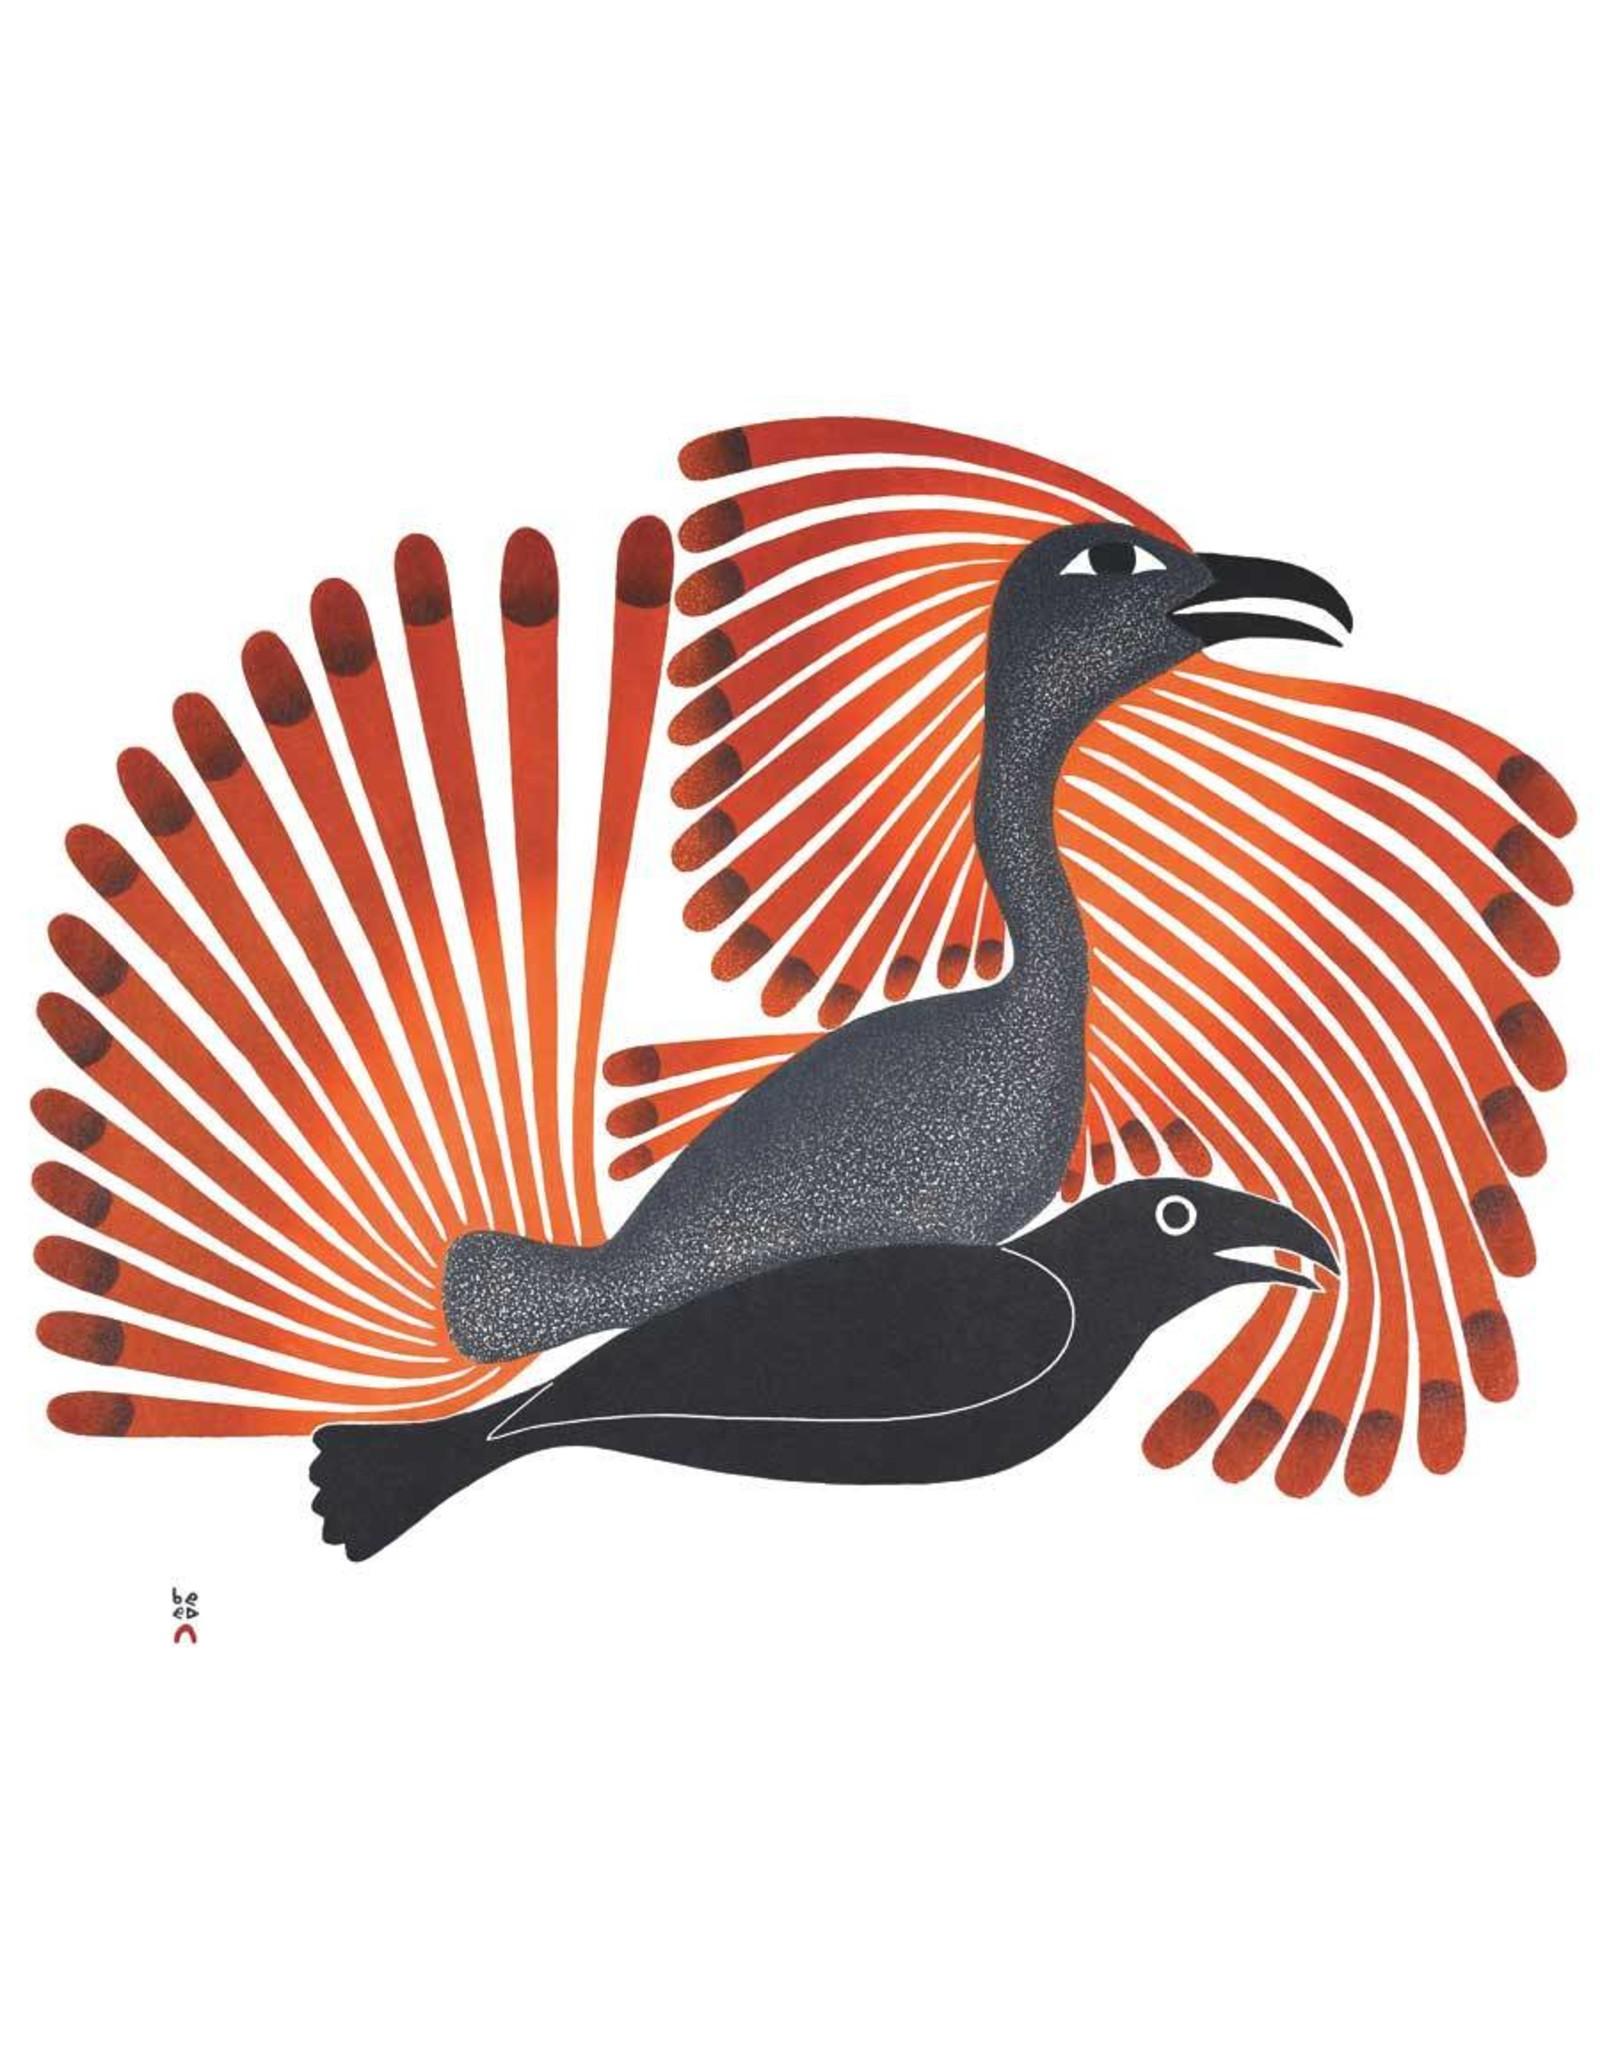 Intruding Raven, 2001 by Kenojuak Ashevak Framed